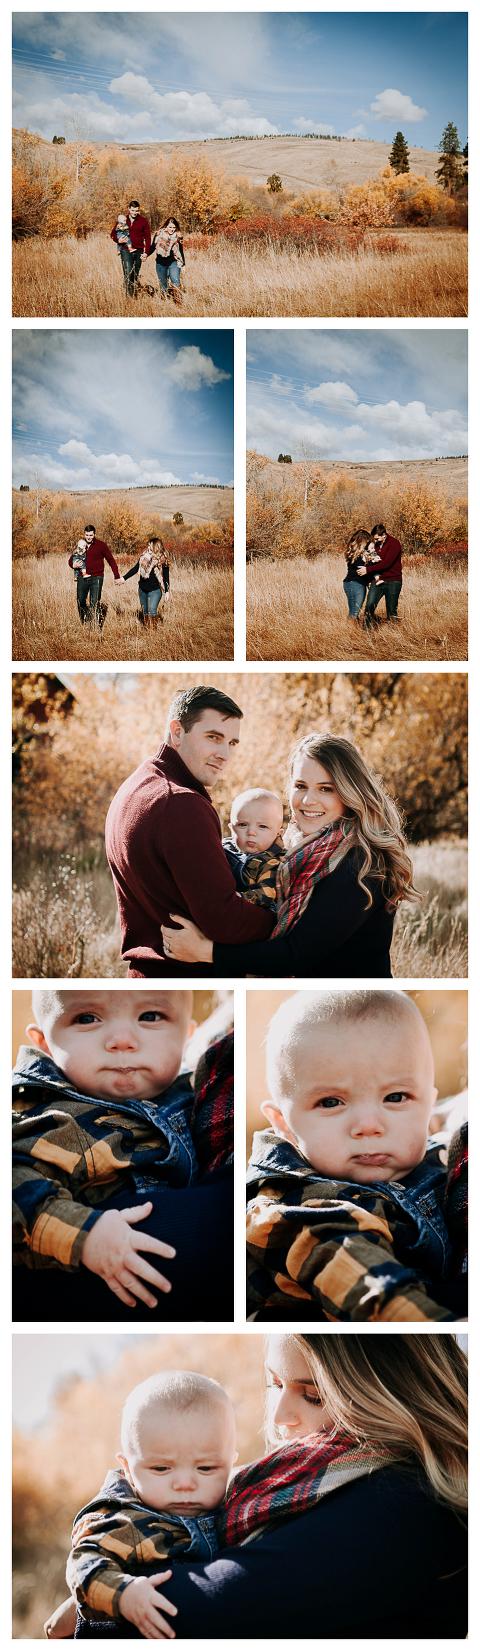 Elliott Family, Haberman Family, Lifestyle session captured by Hailey Haberman, Ellensburg, WA